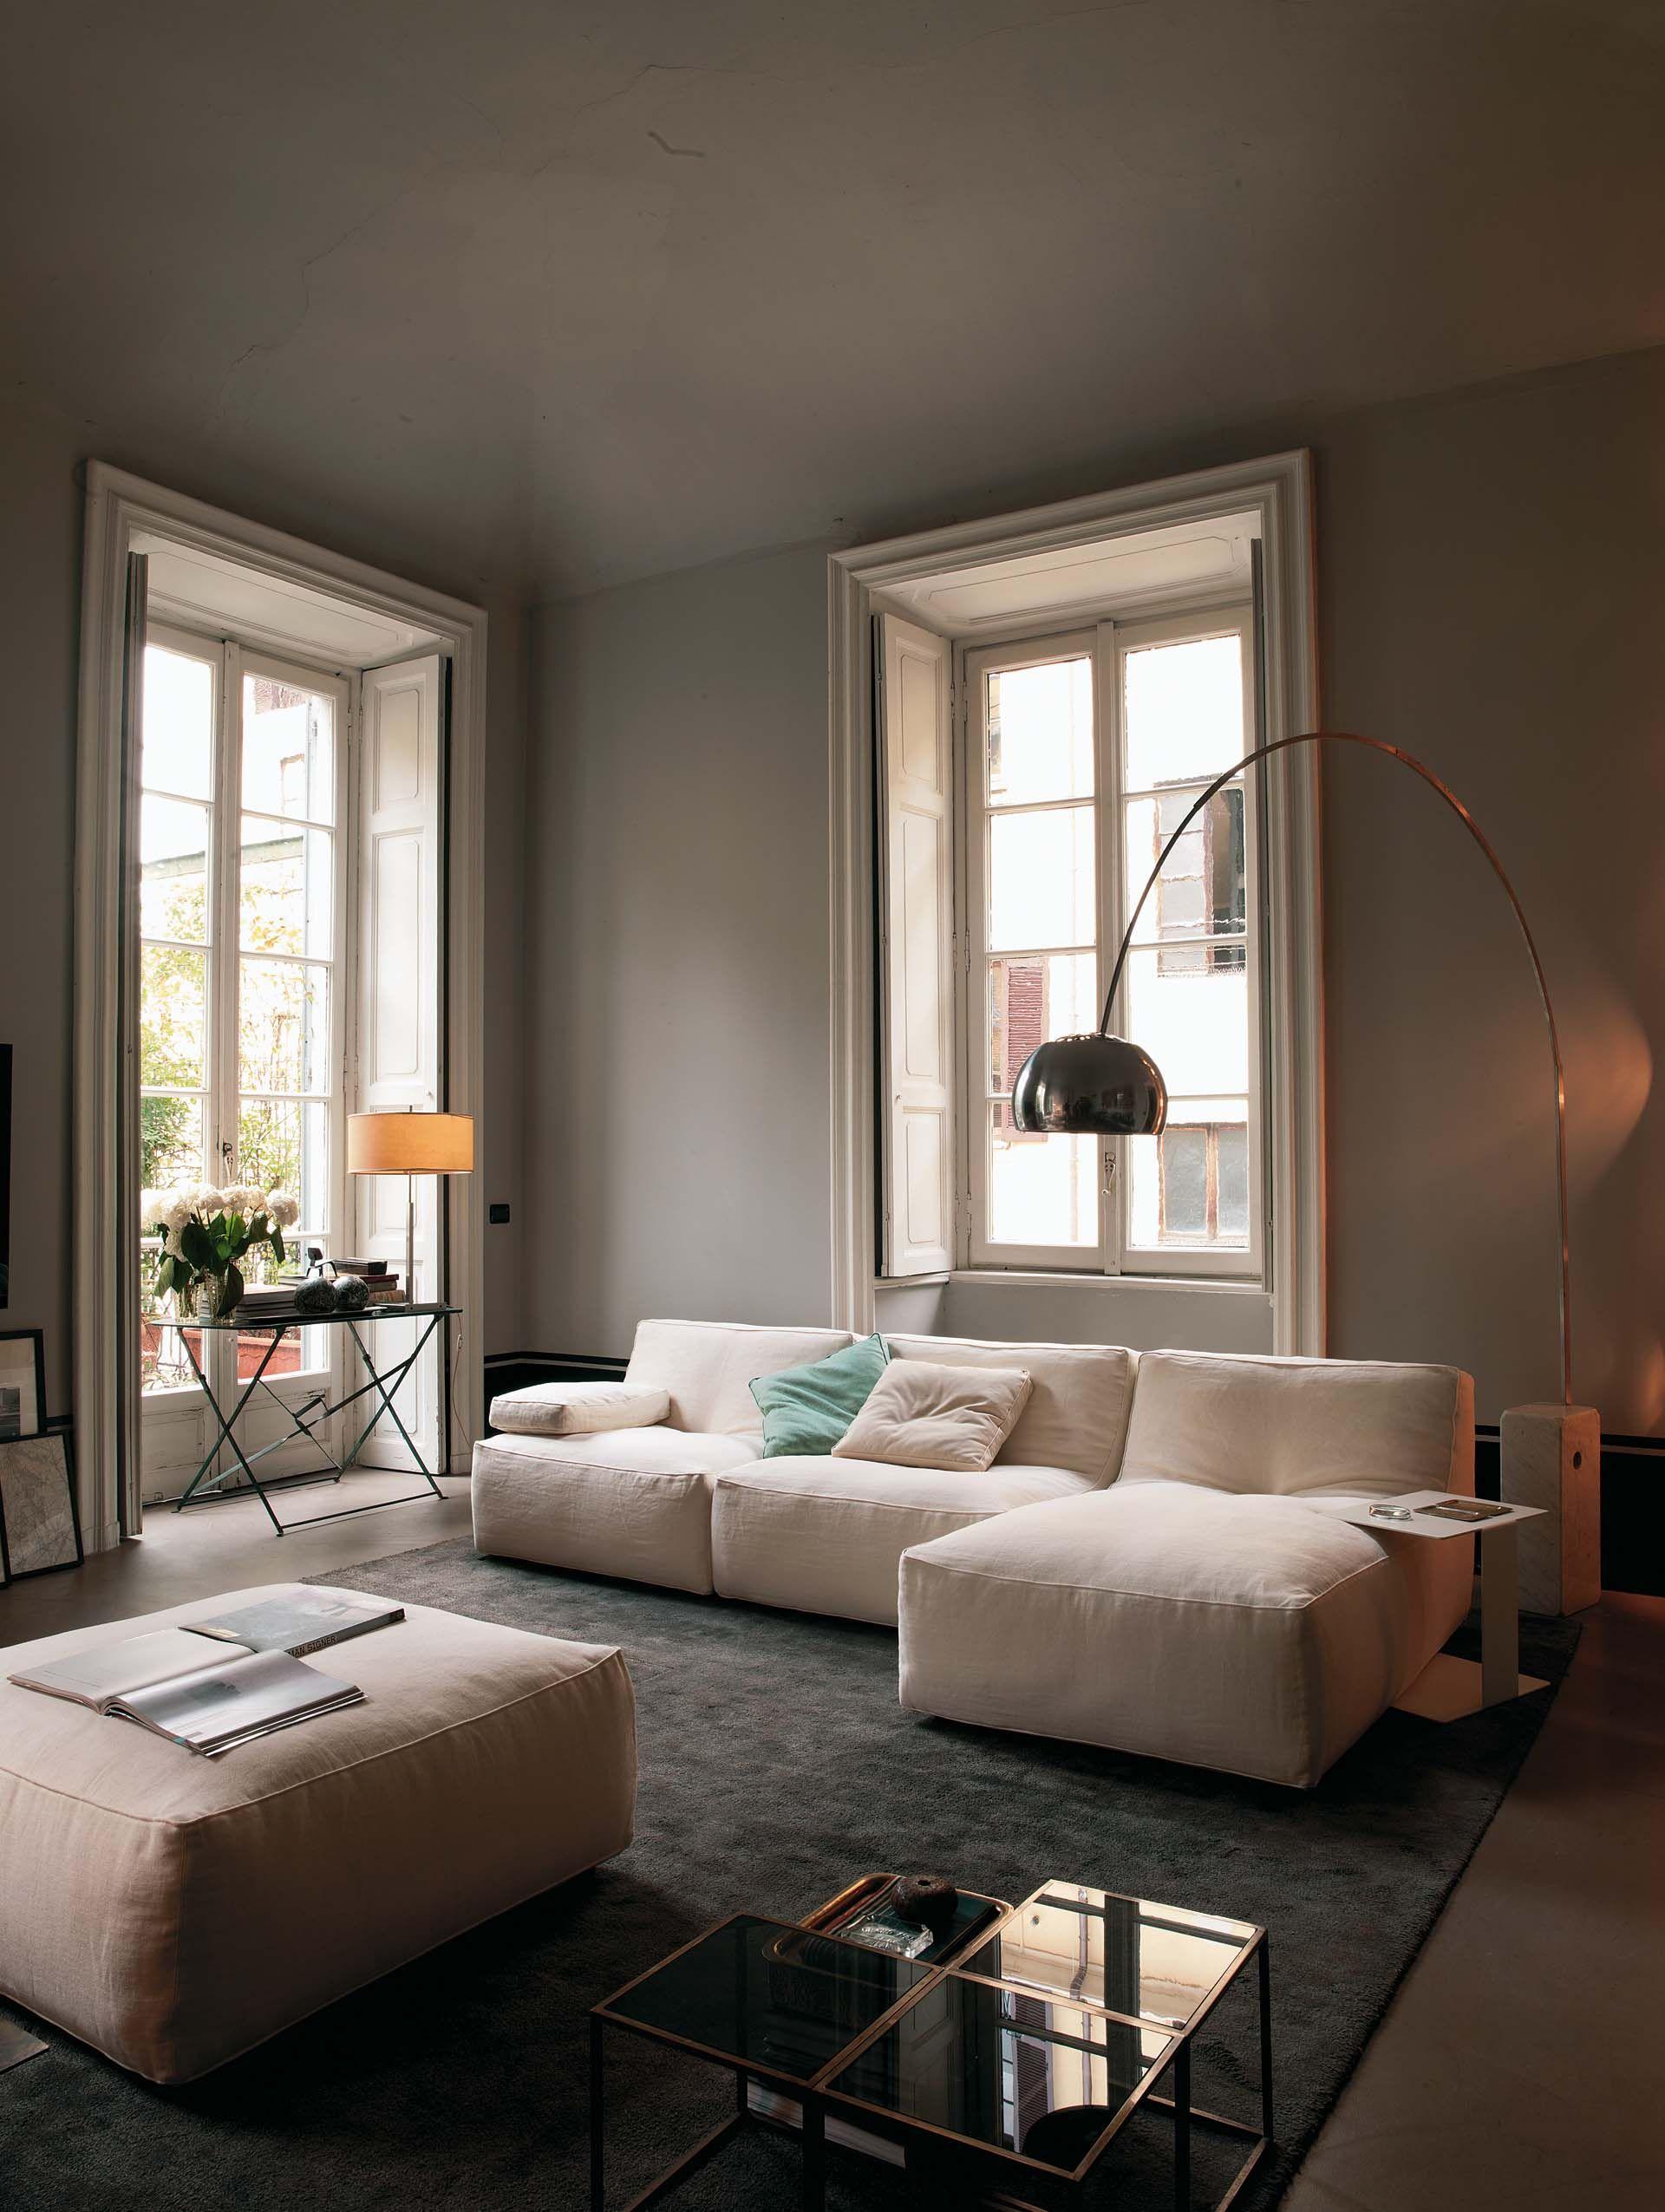 Noe Verzelloni In 2020 Small Living Room Design Living Room Designs Home